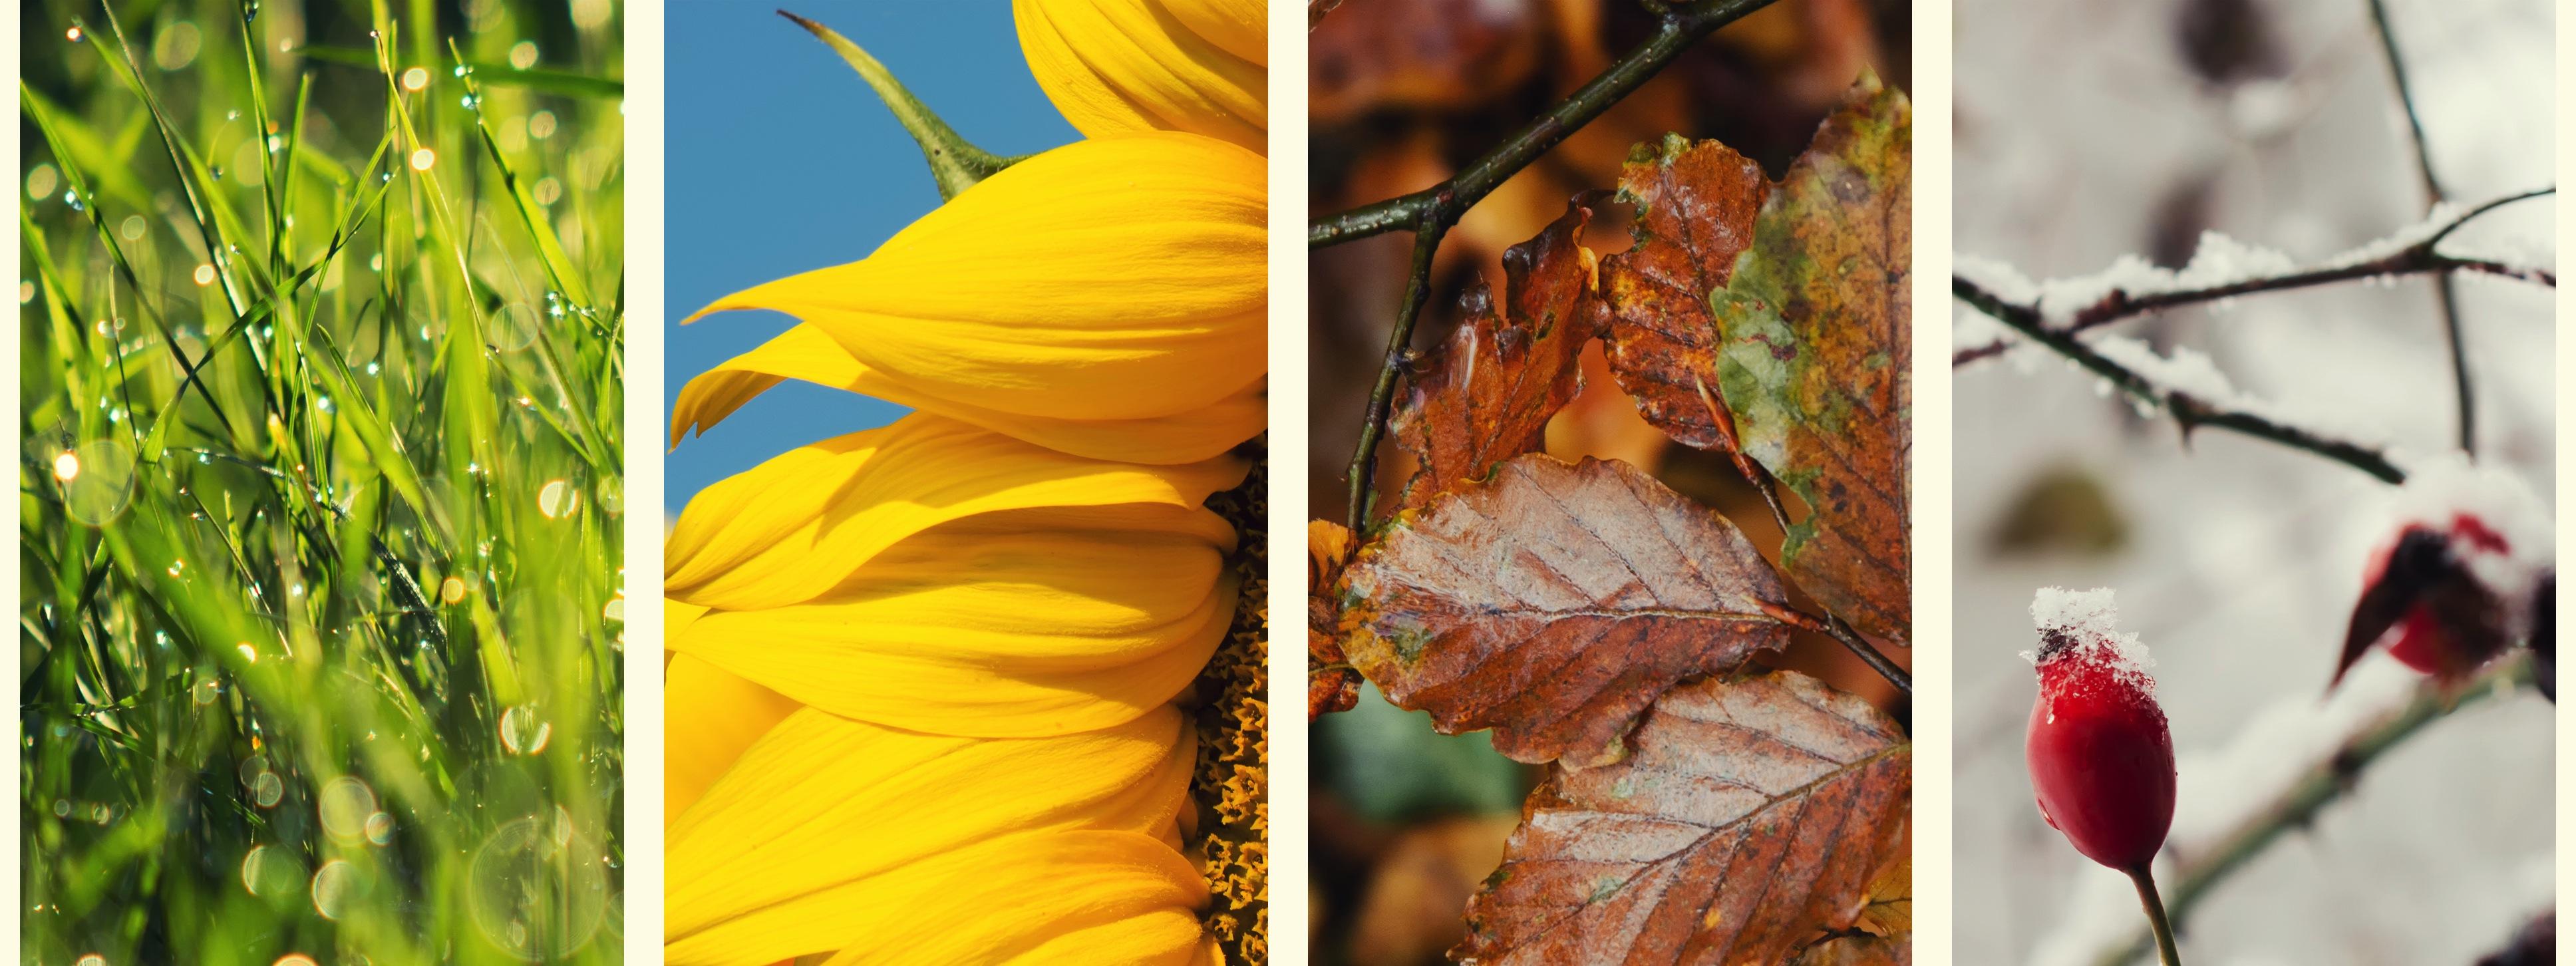 S Name Wallpaper Hd Download Seasonal Picture 3872x1452 Full Hd Wall